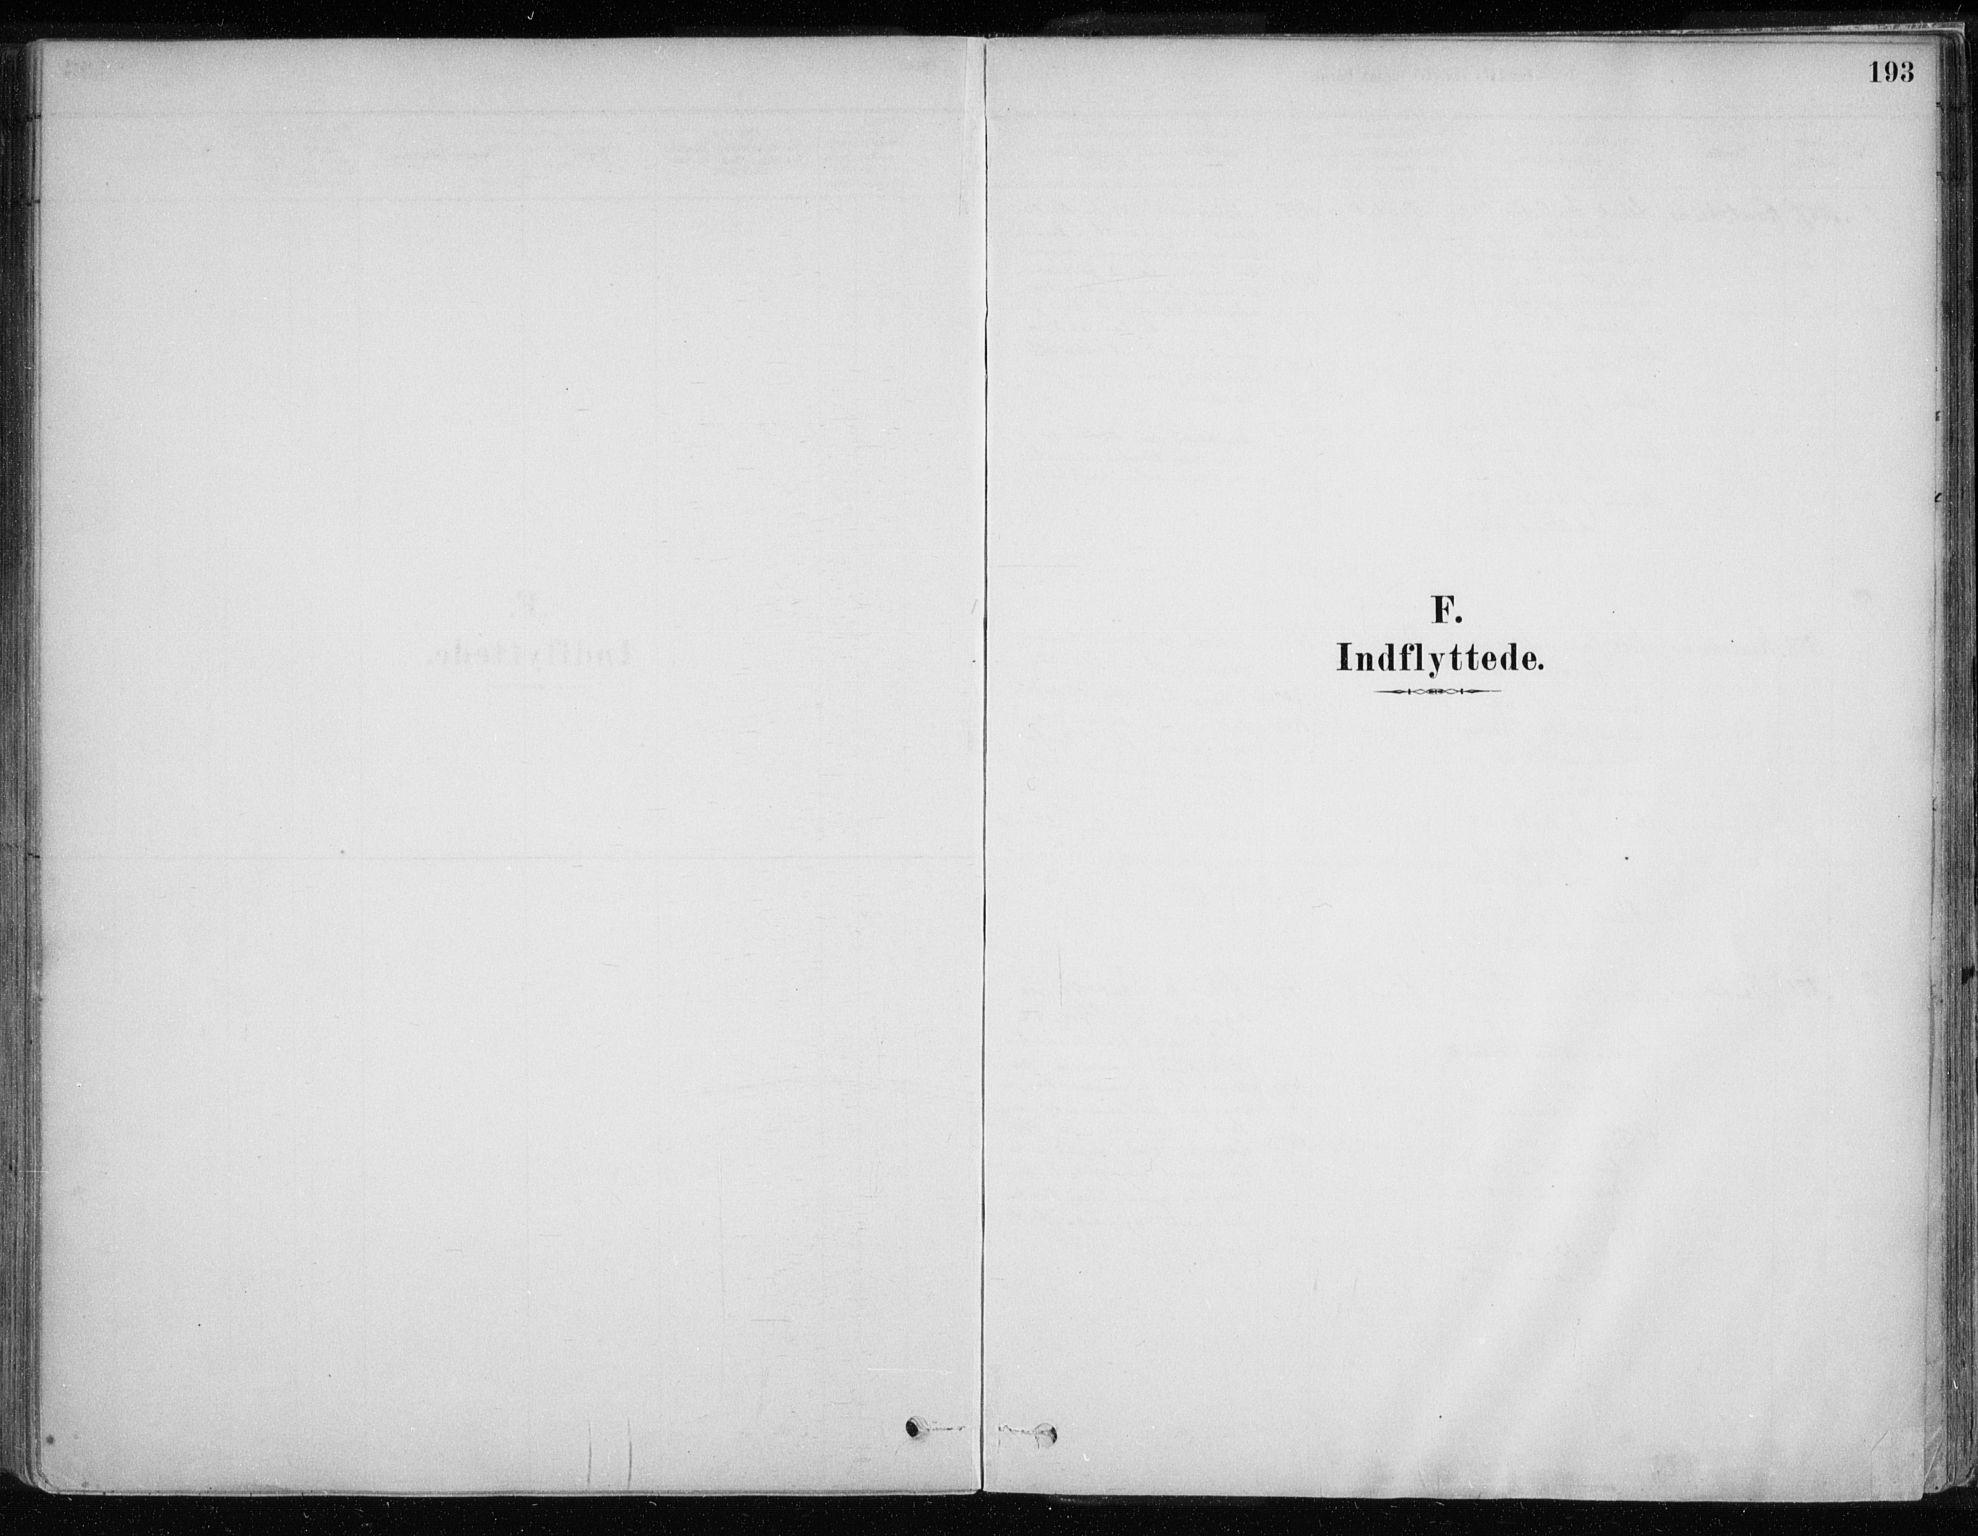 SATØ, Karasjok sokneprestkontor, H/Ha/L0002kirke: Ministerialbok nr. 2, 1885-1906, s. 193